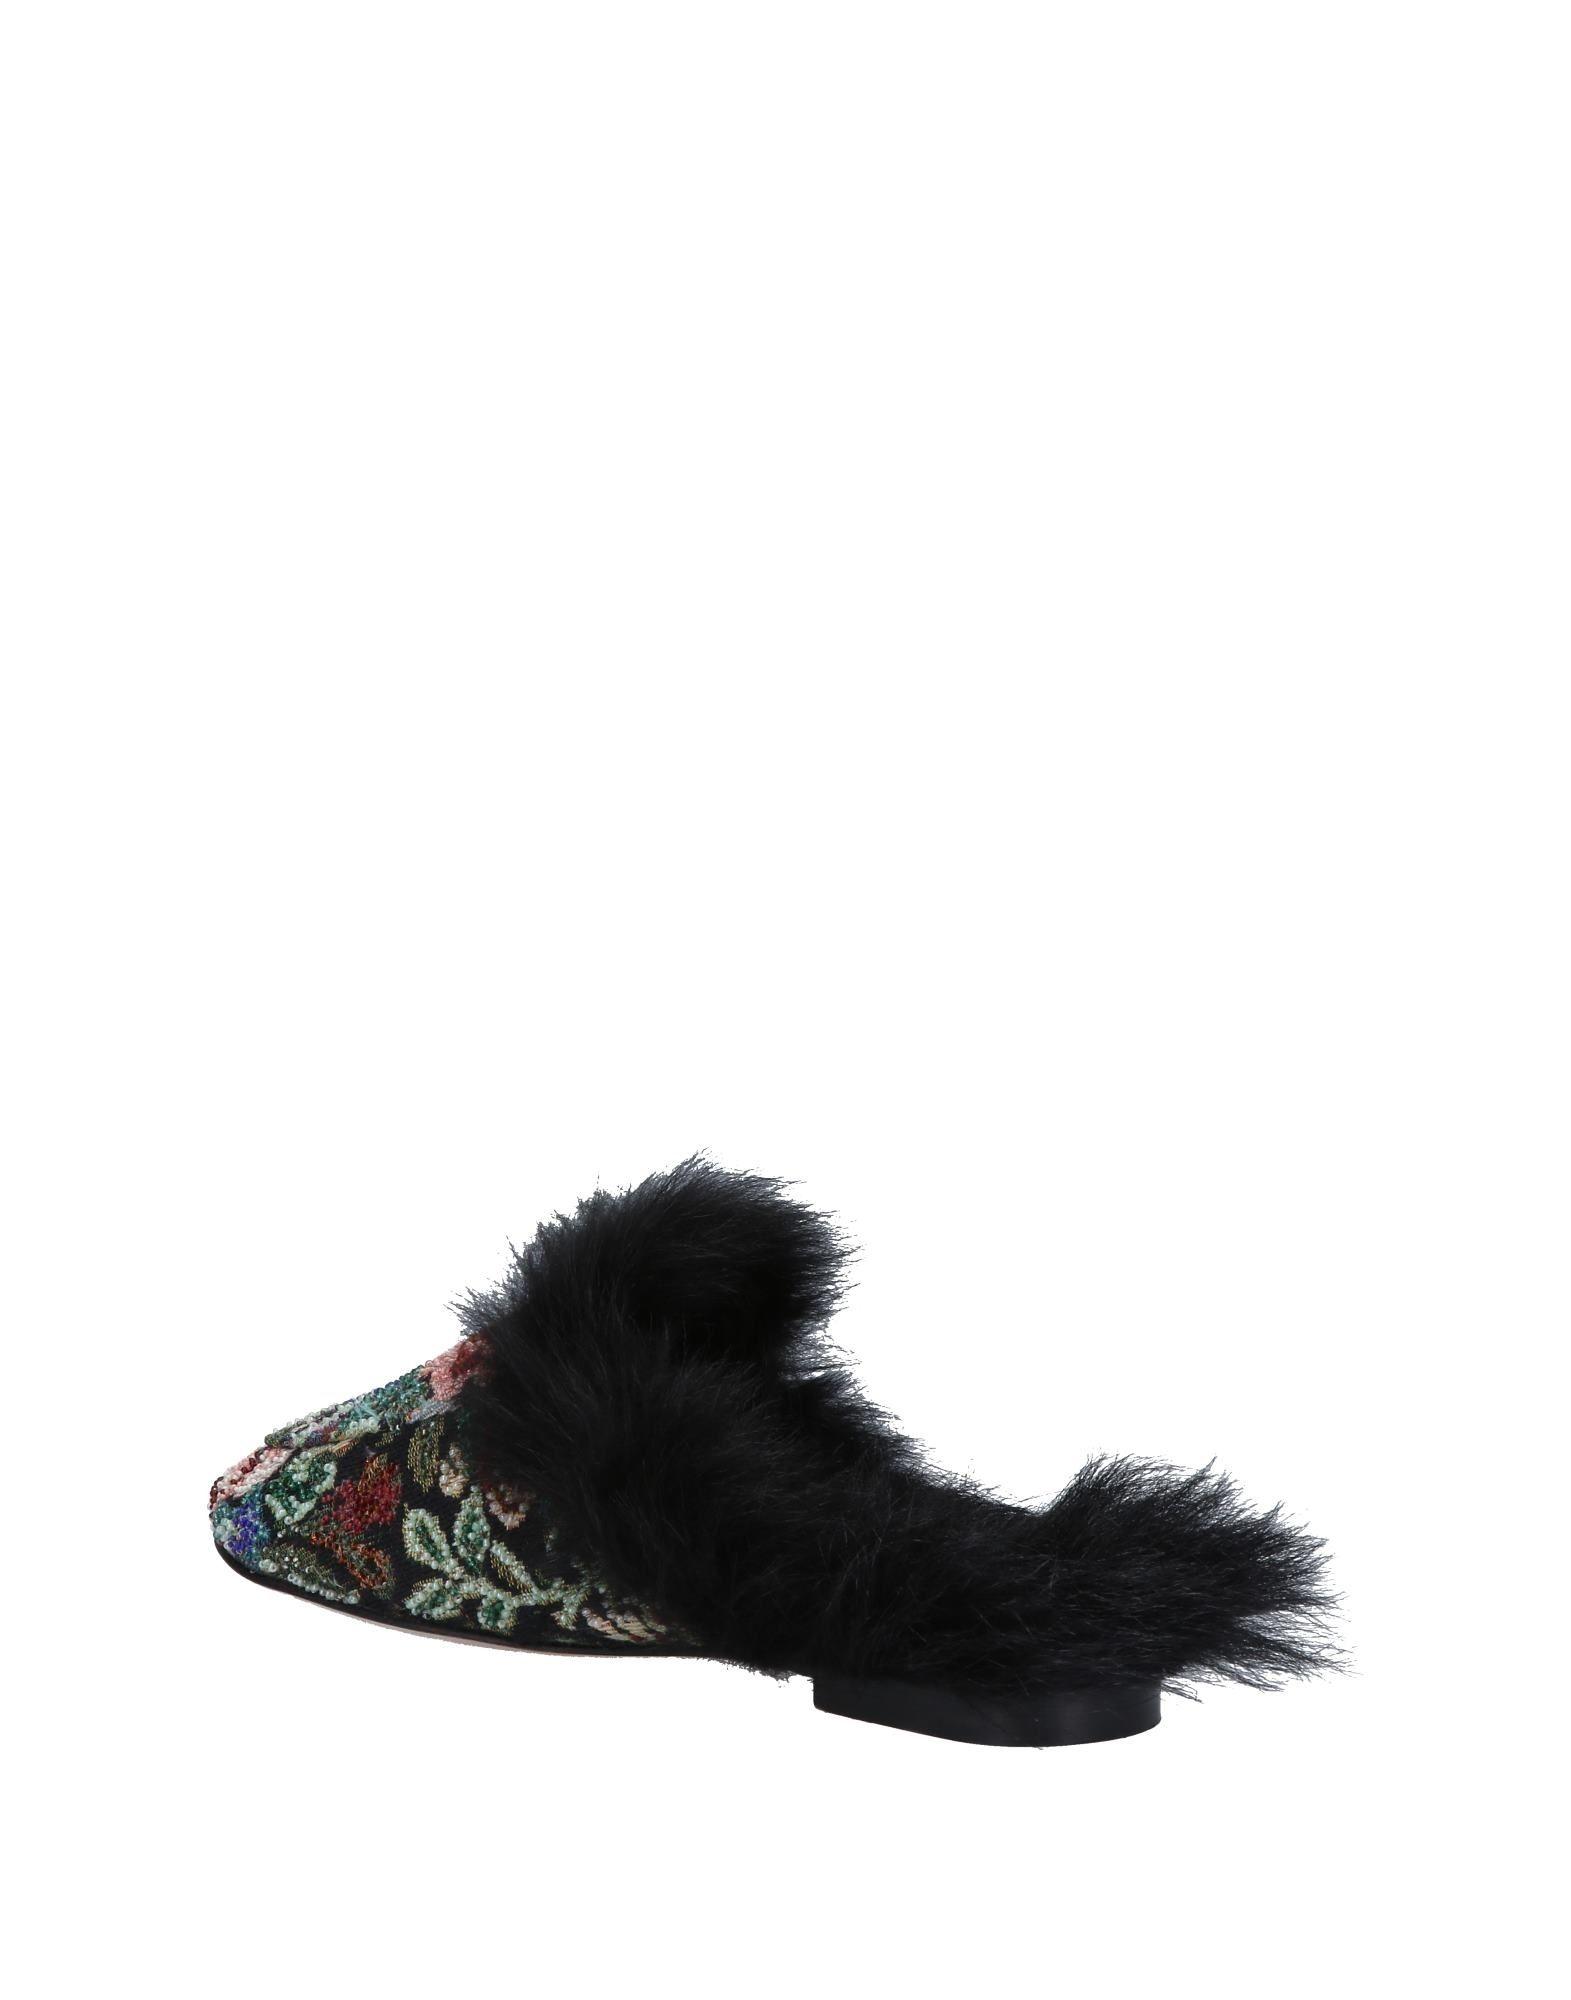 Coral Blue Pantoletten Damen    11495349WI Gute Qualität beliebte Schuhe 18bf9e